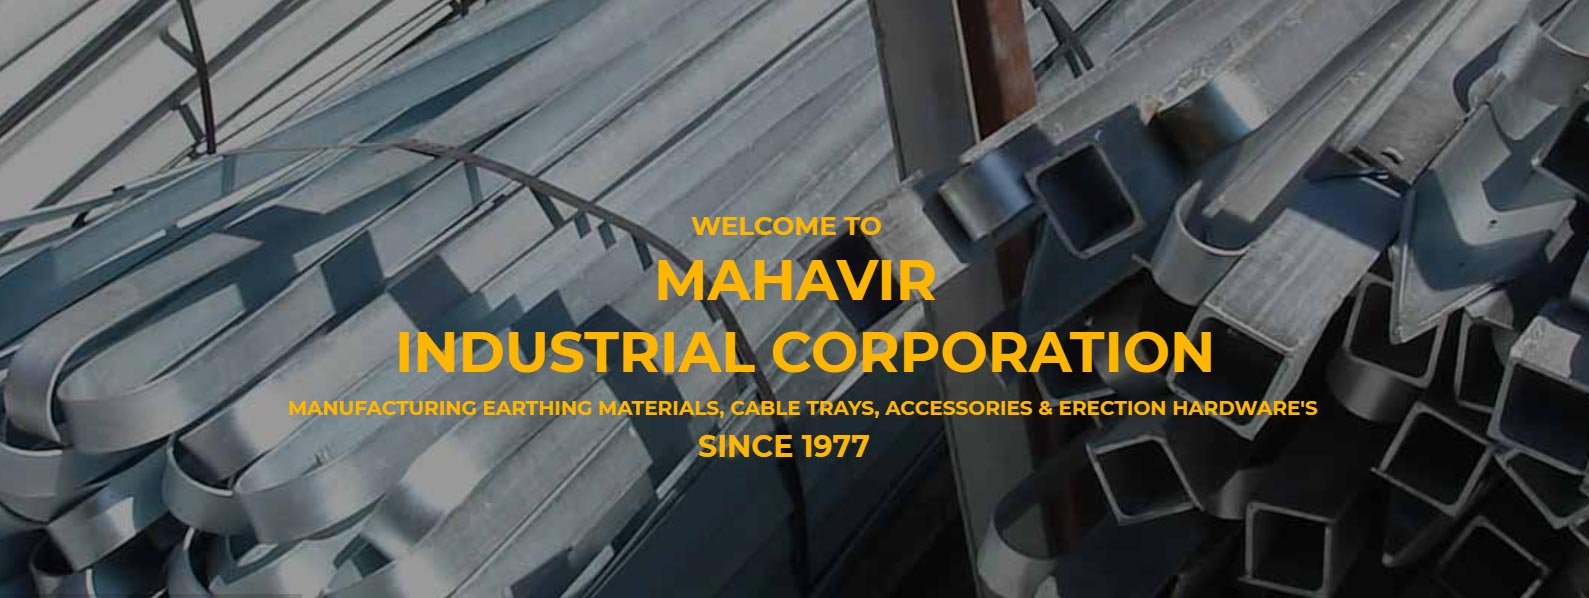 Mahavir Industrial Corporation banner